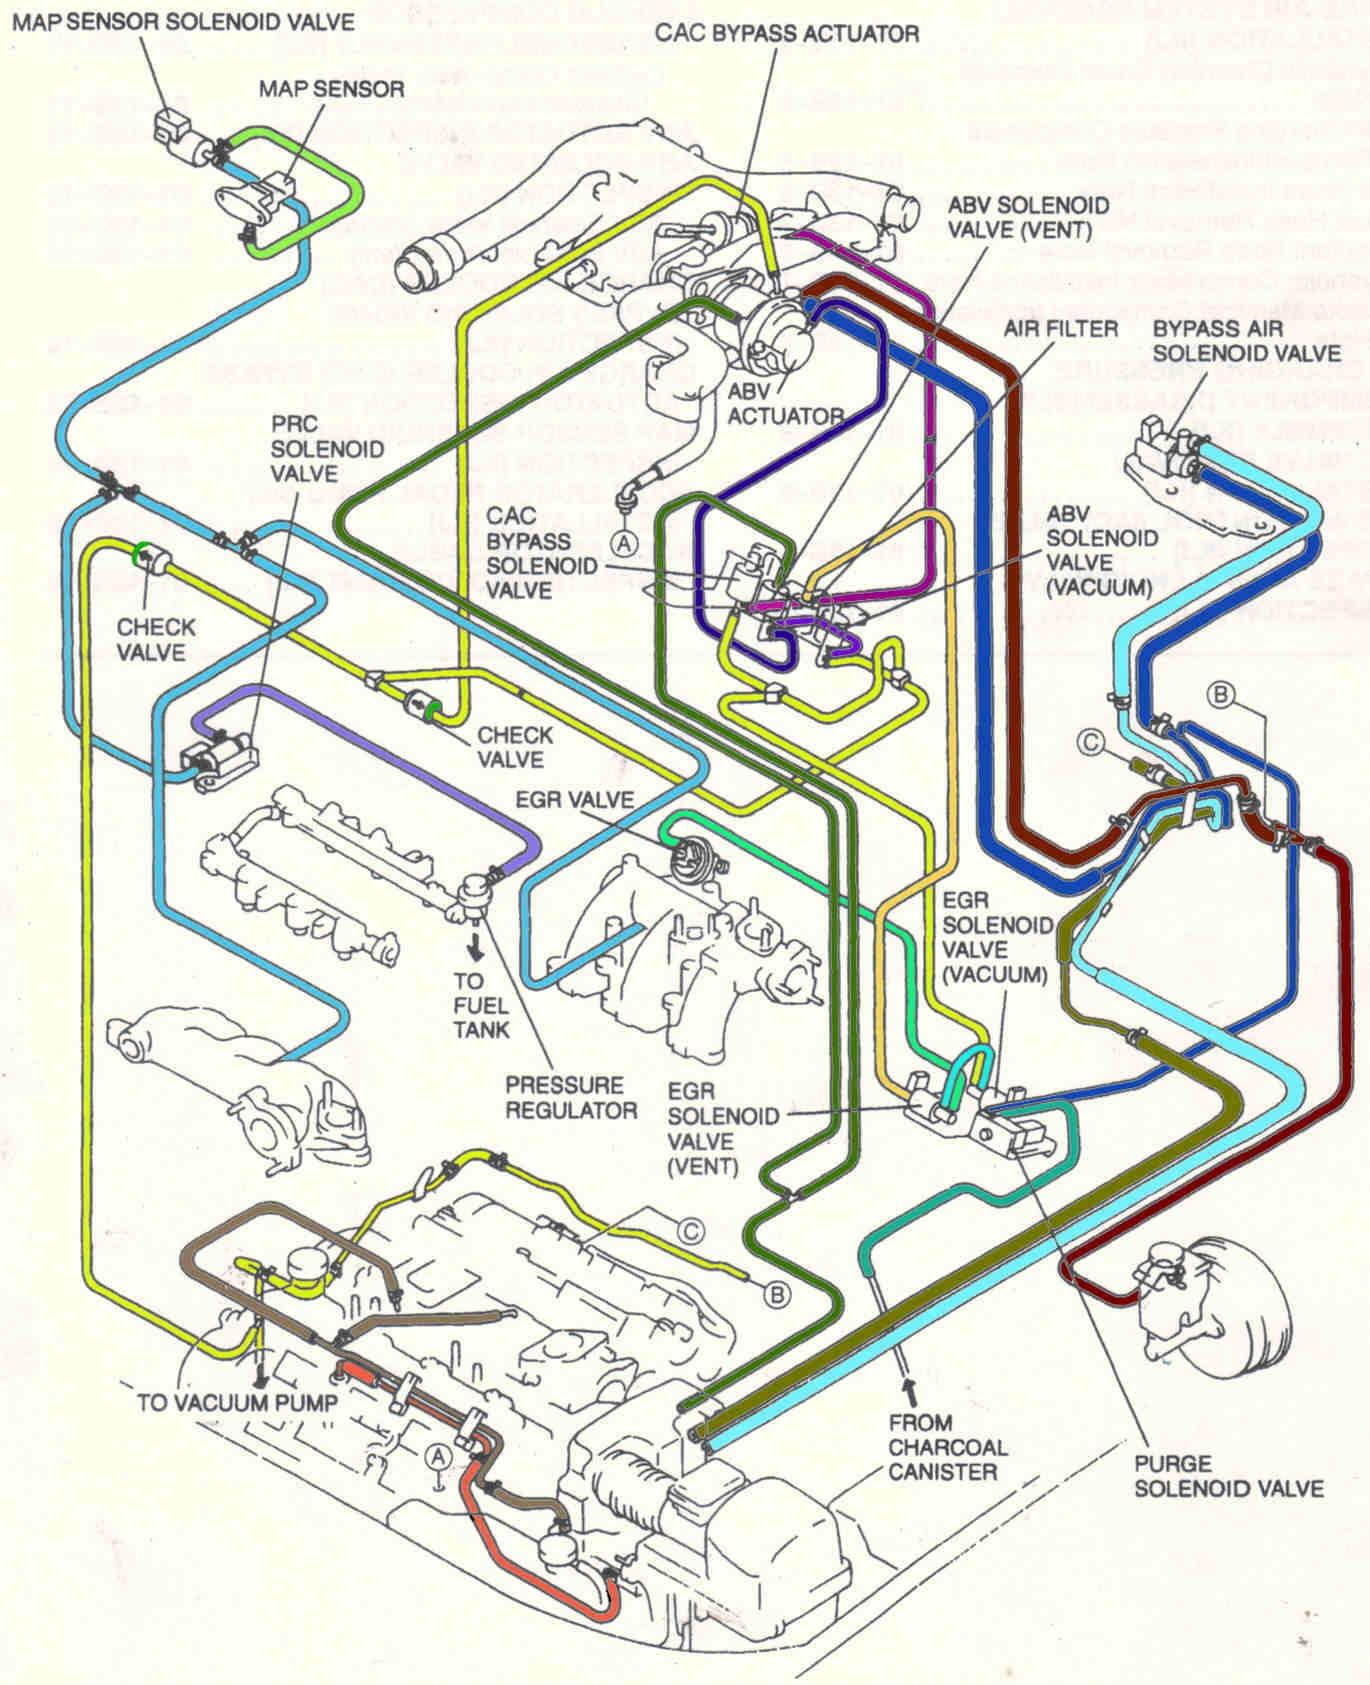 hight resolution of 1993 mazda 626 engine diagram wiring library rh 13 dirtytalk camgirls de 2001 mazda millenia engine diagram belt 2004 mazda 3 engine diagram